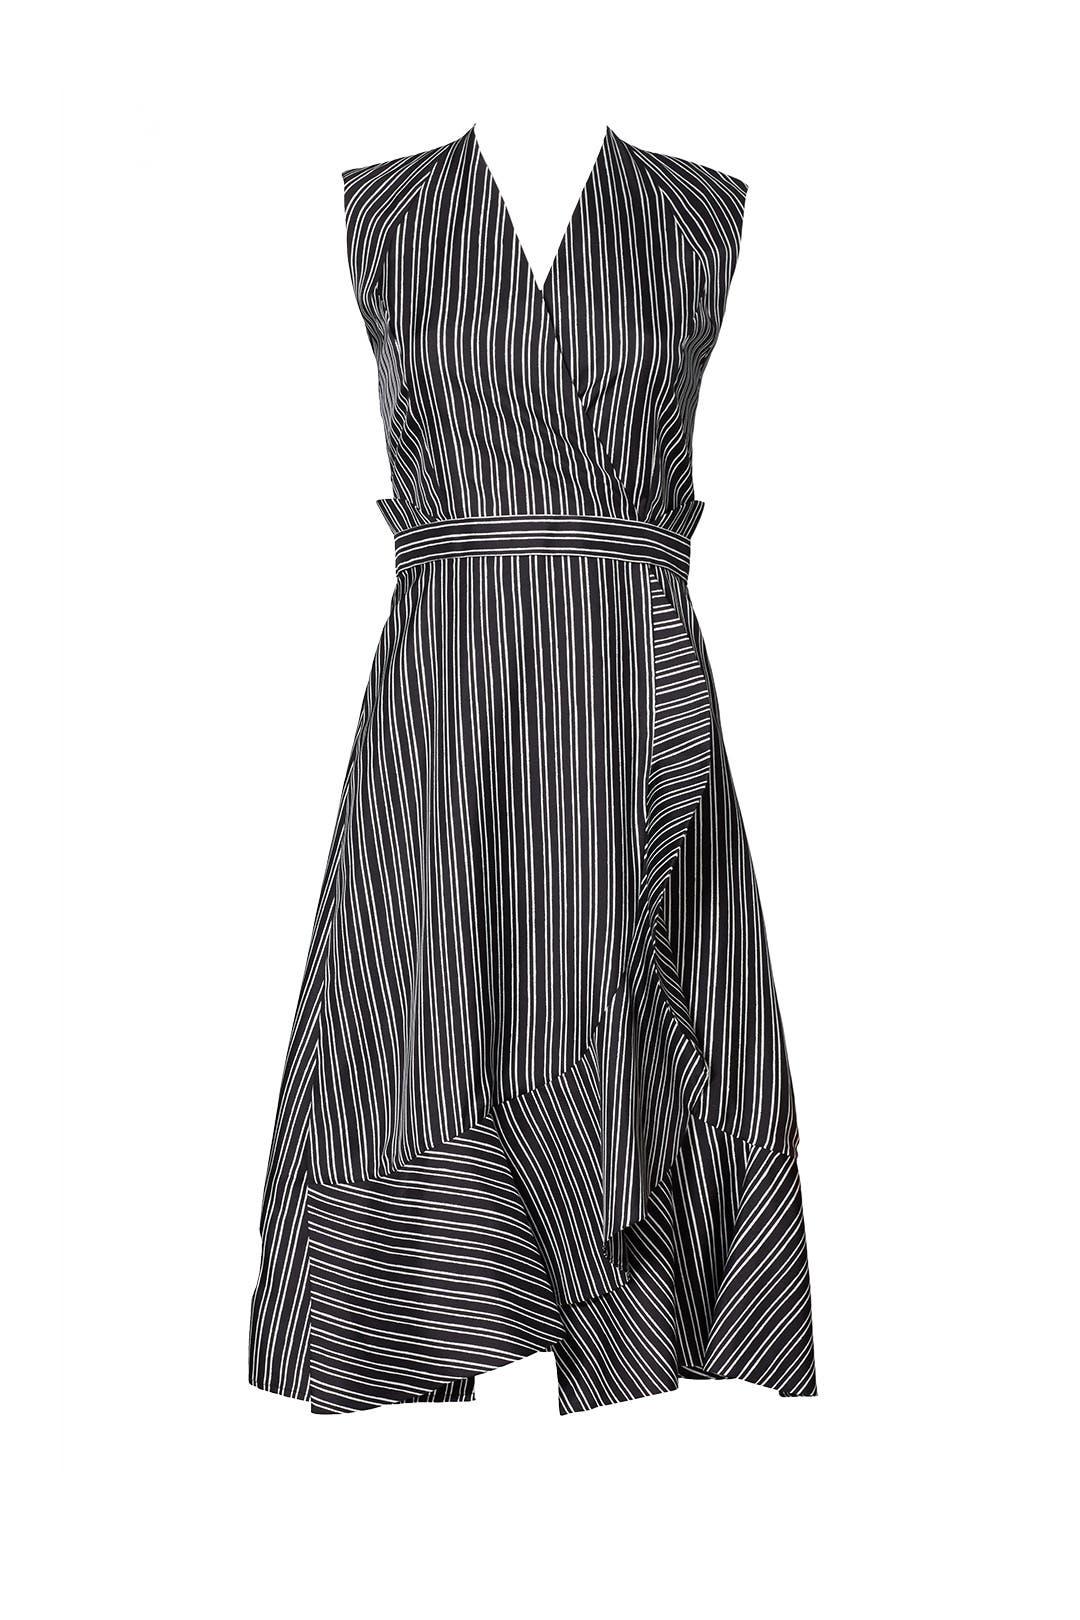 c9d8b6e3f60 Rent The Runway Little White Dress - Gomes Weine AG